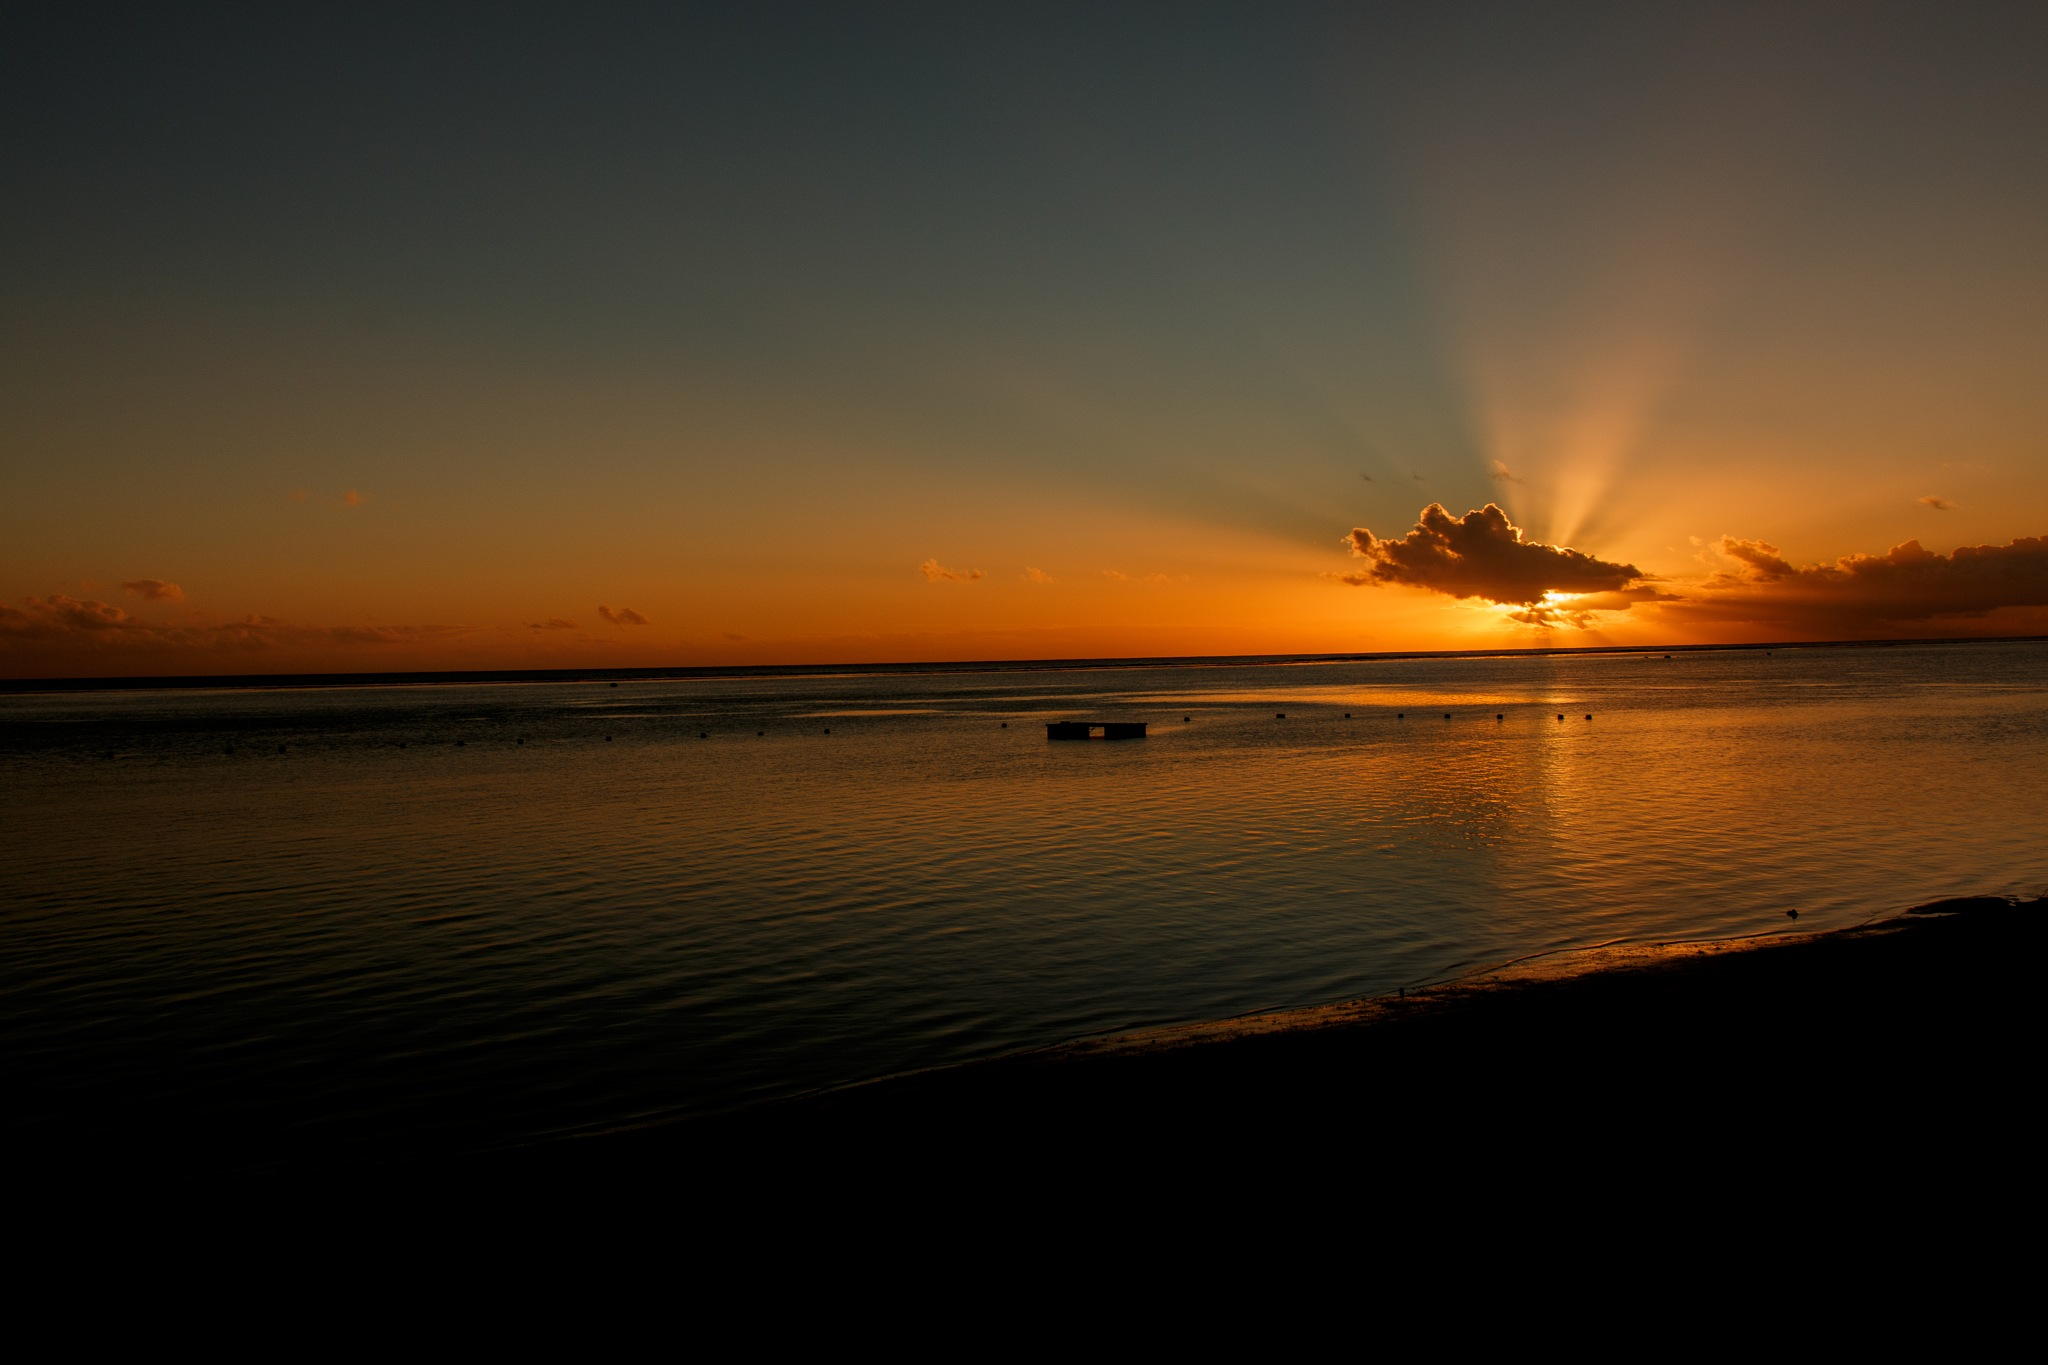 Playa mauriciana by Luisbaneres